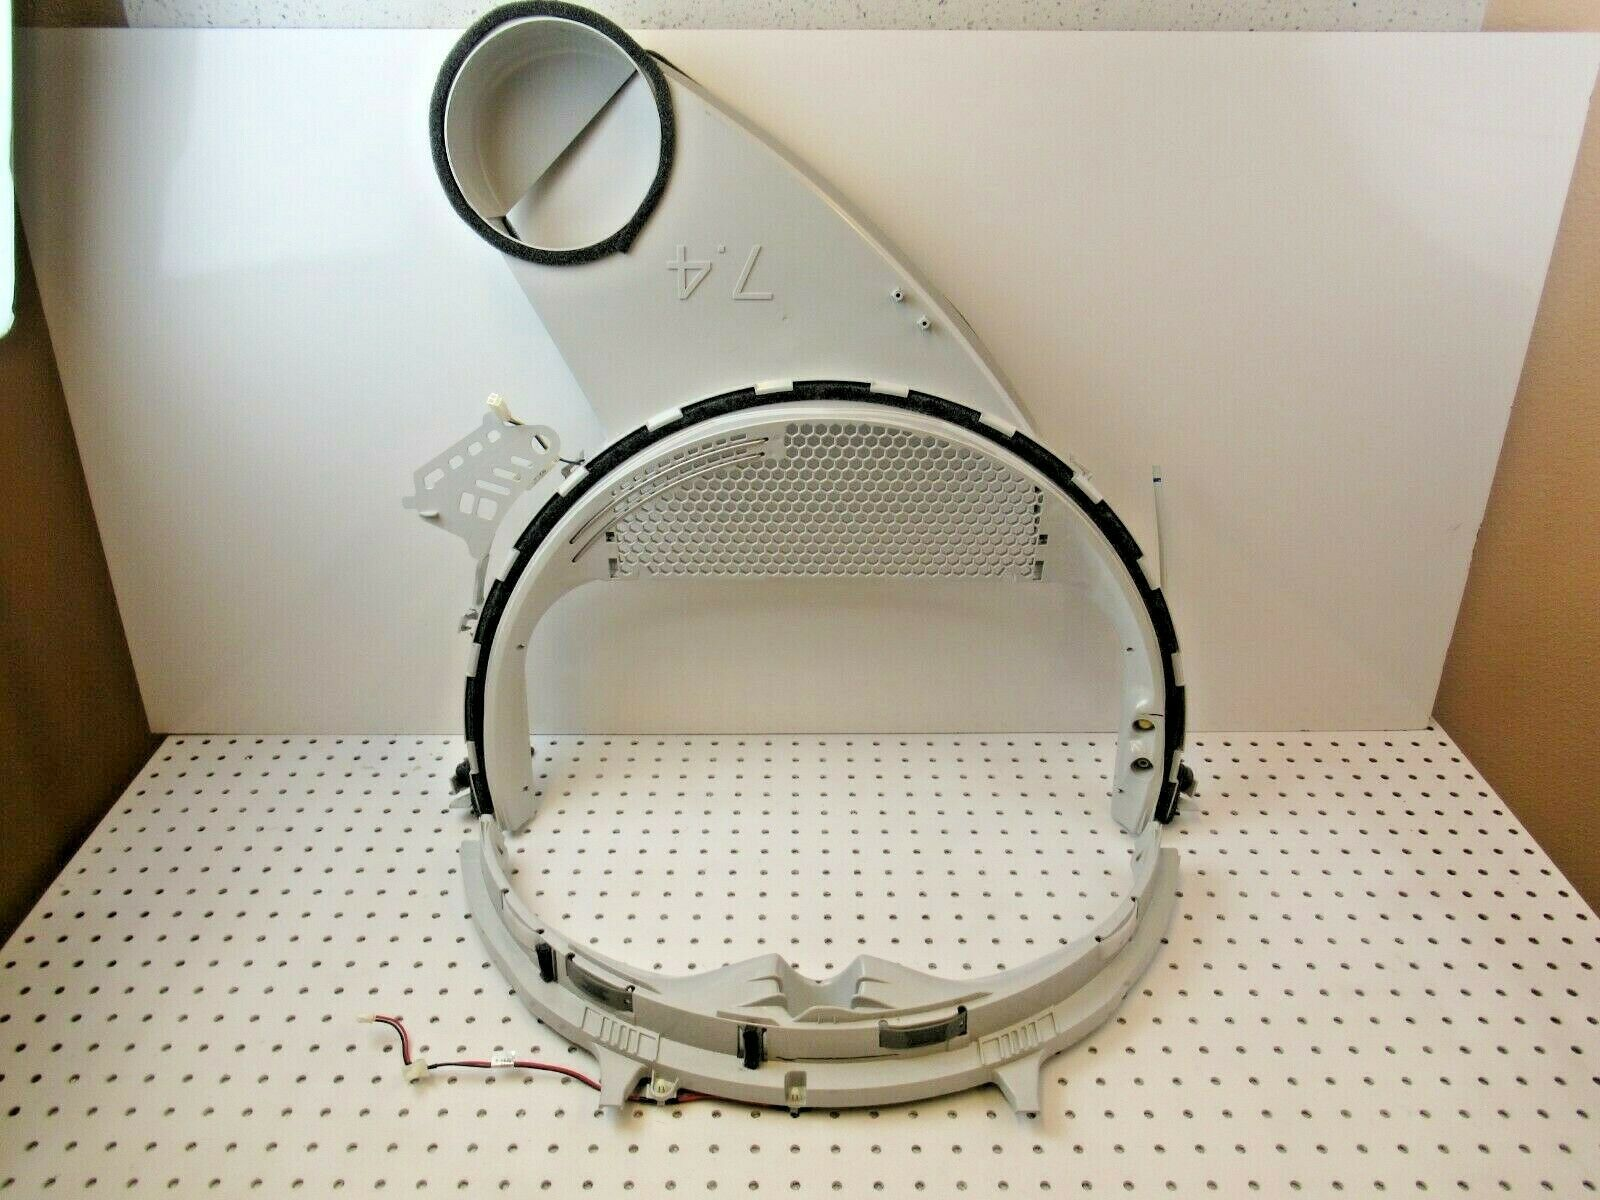 GE Dryer Trap Duct w/Bearing Top WE03X23875 WE16X29472 WE16X29473 WE03X23956 - $98.95